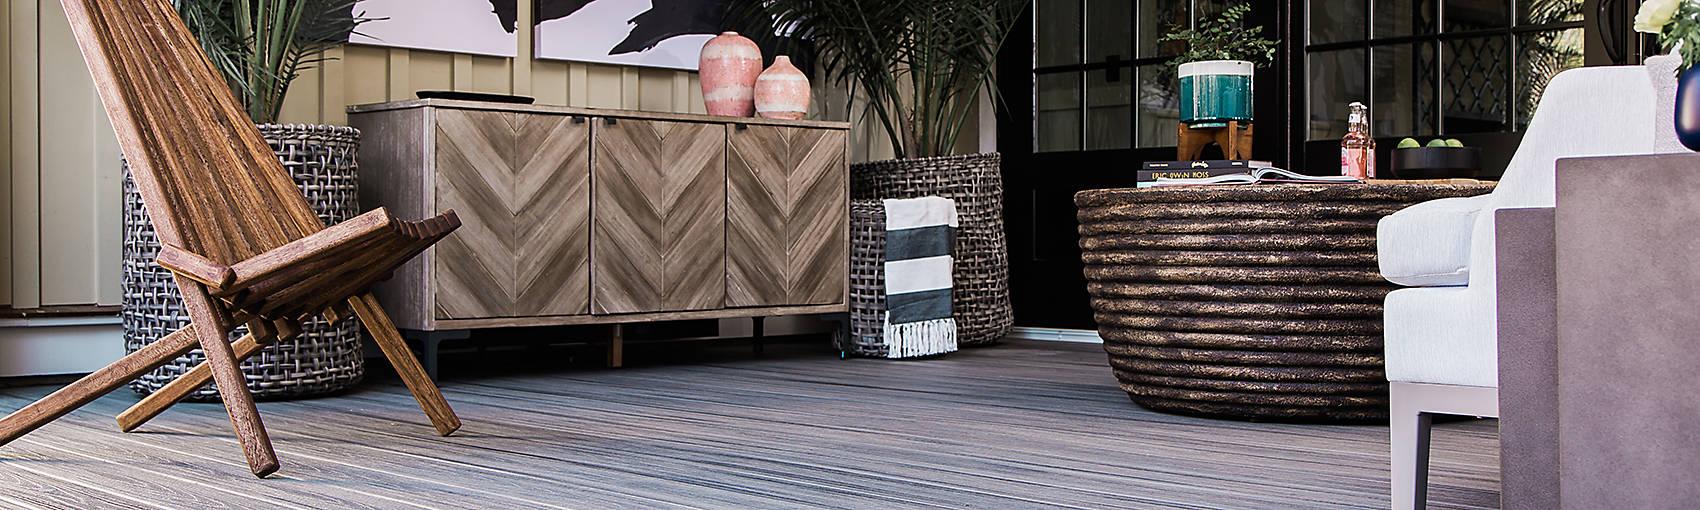 Composite Decking Composite Deck Materials